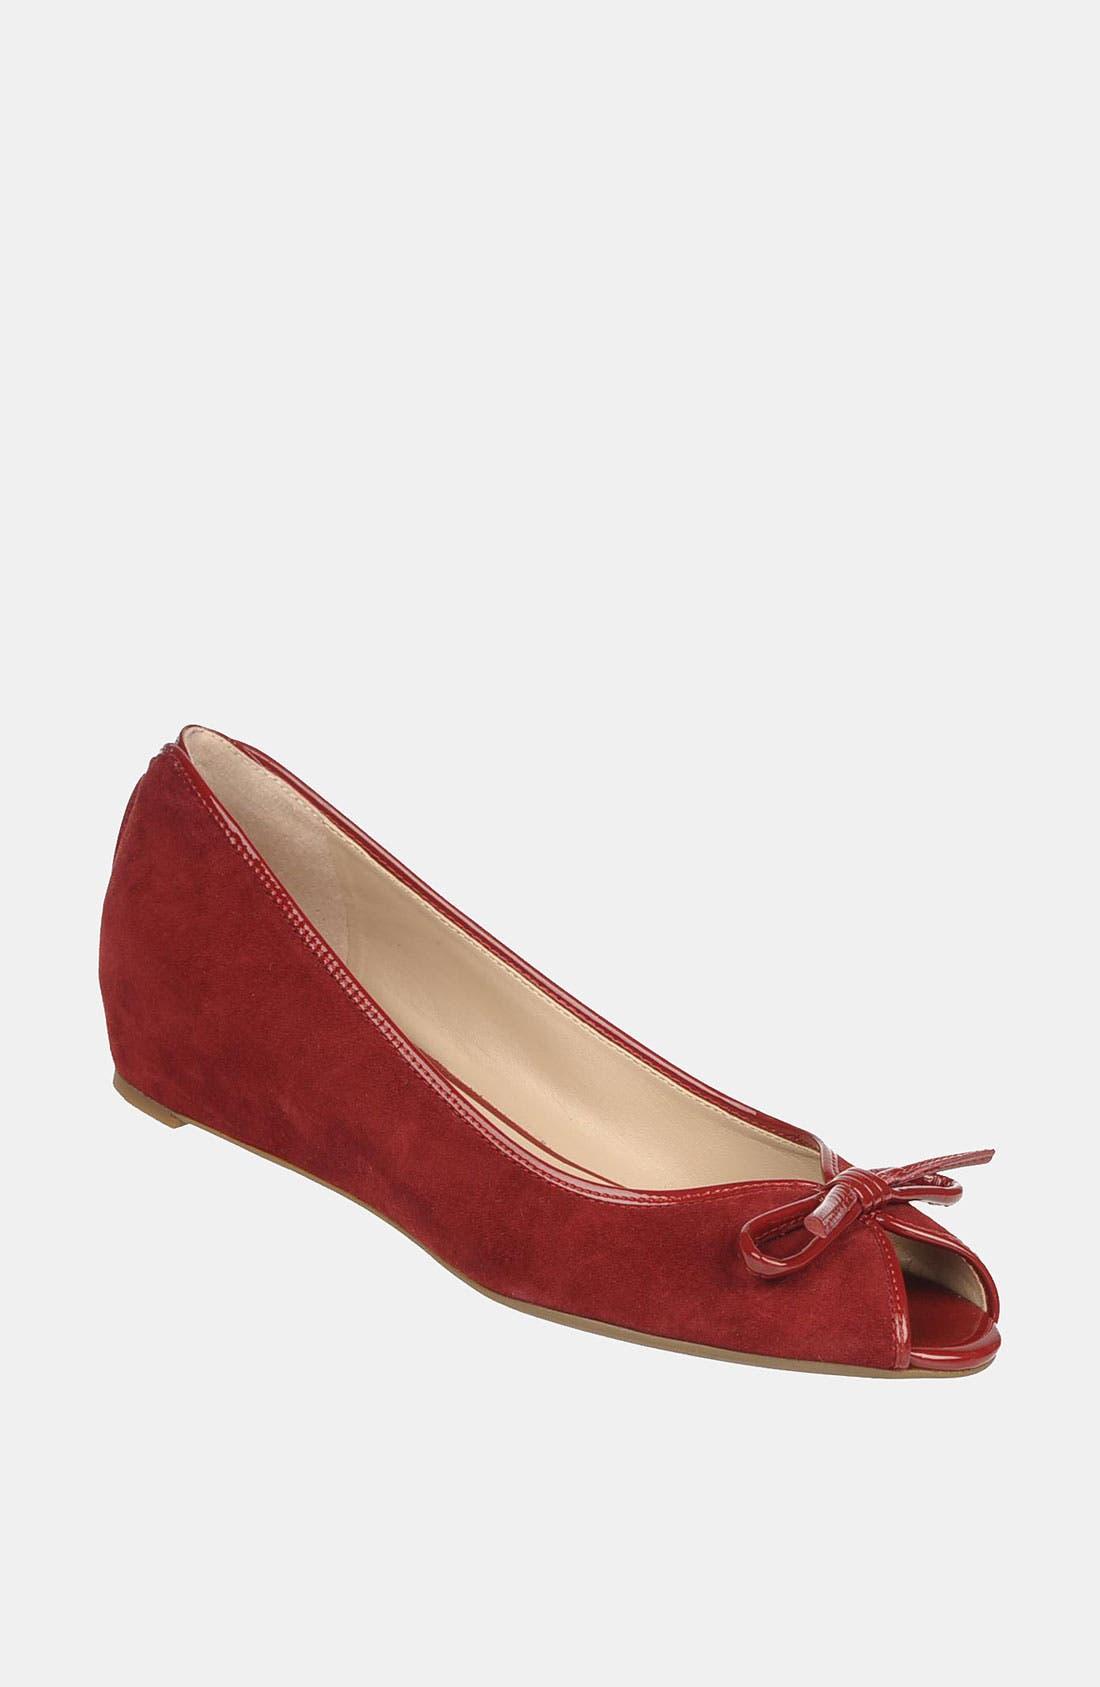 Alternate Image 1 Selected - Franco Sarto 'Model' Peep Toe Flat